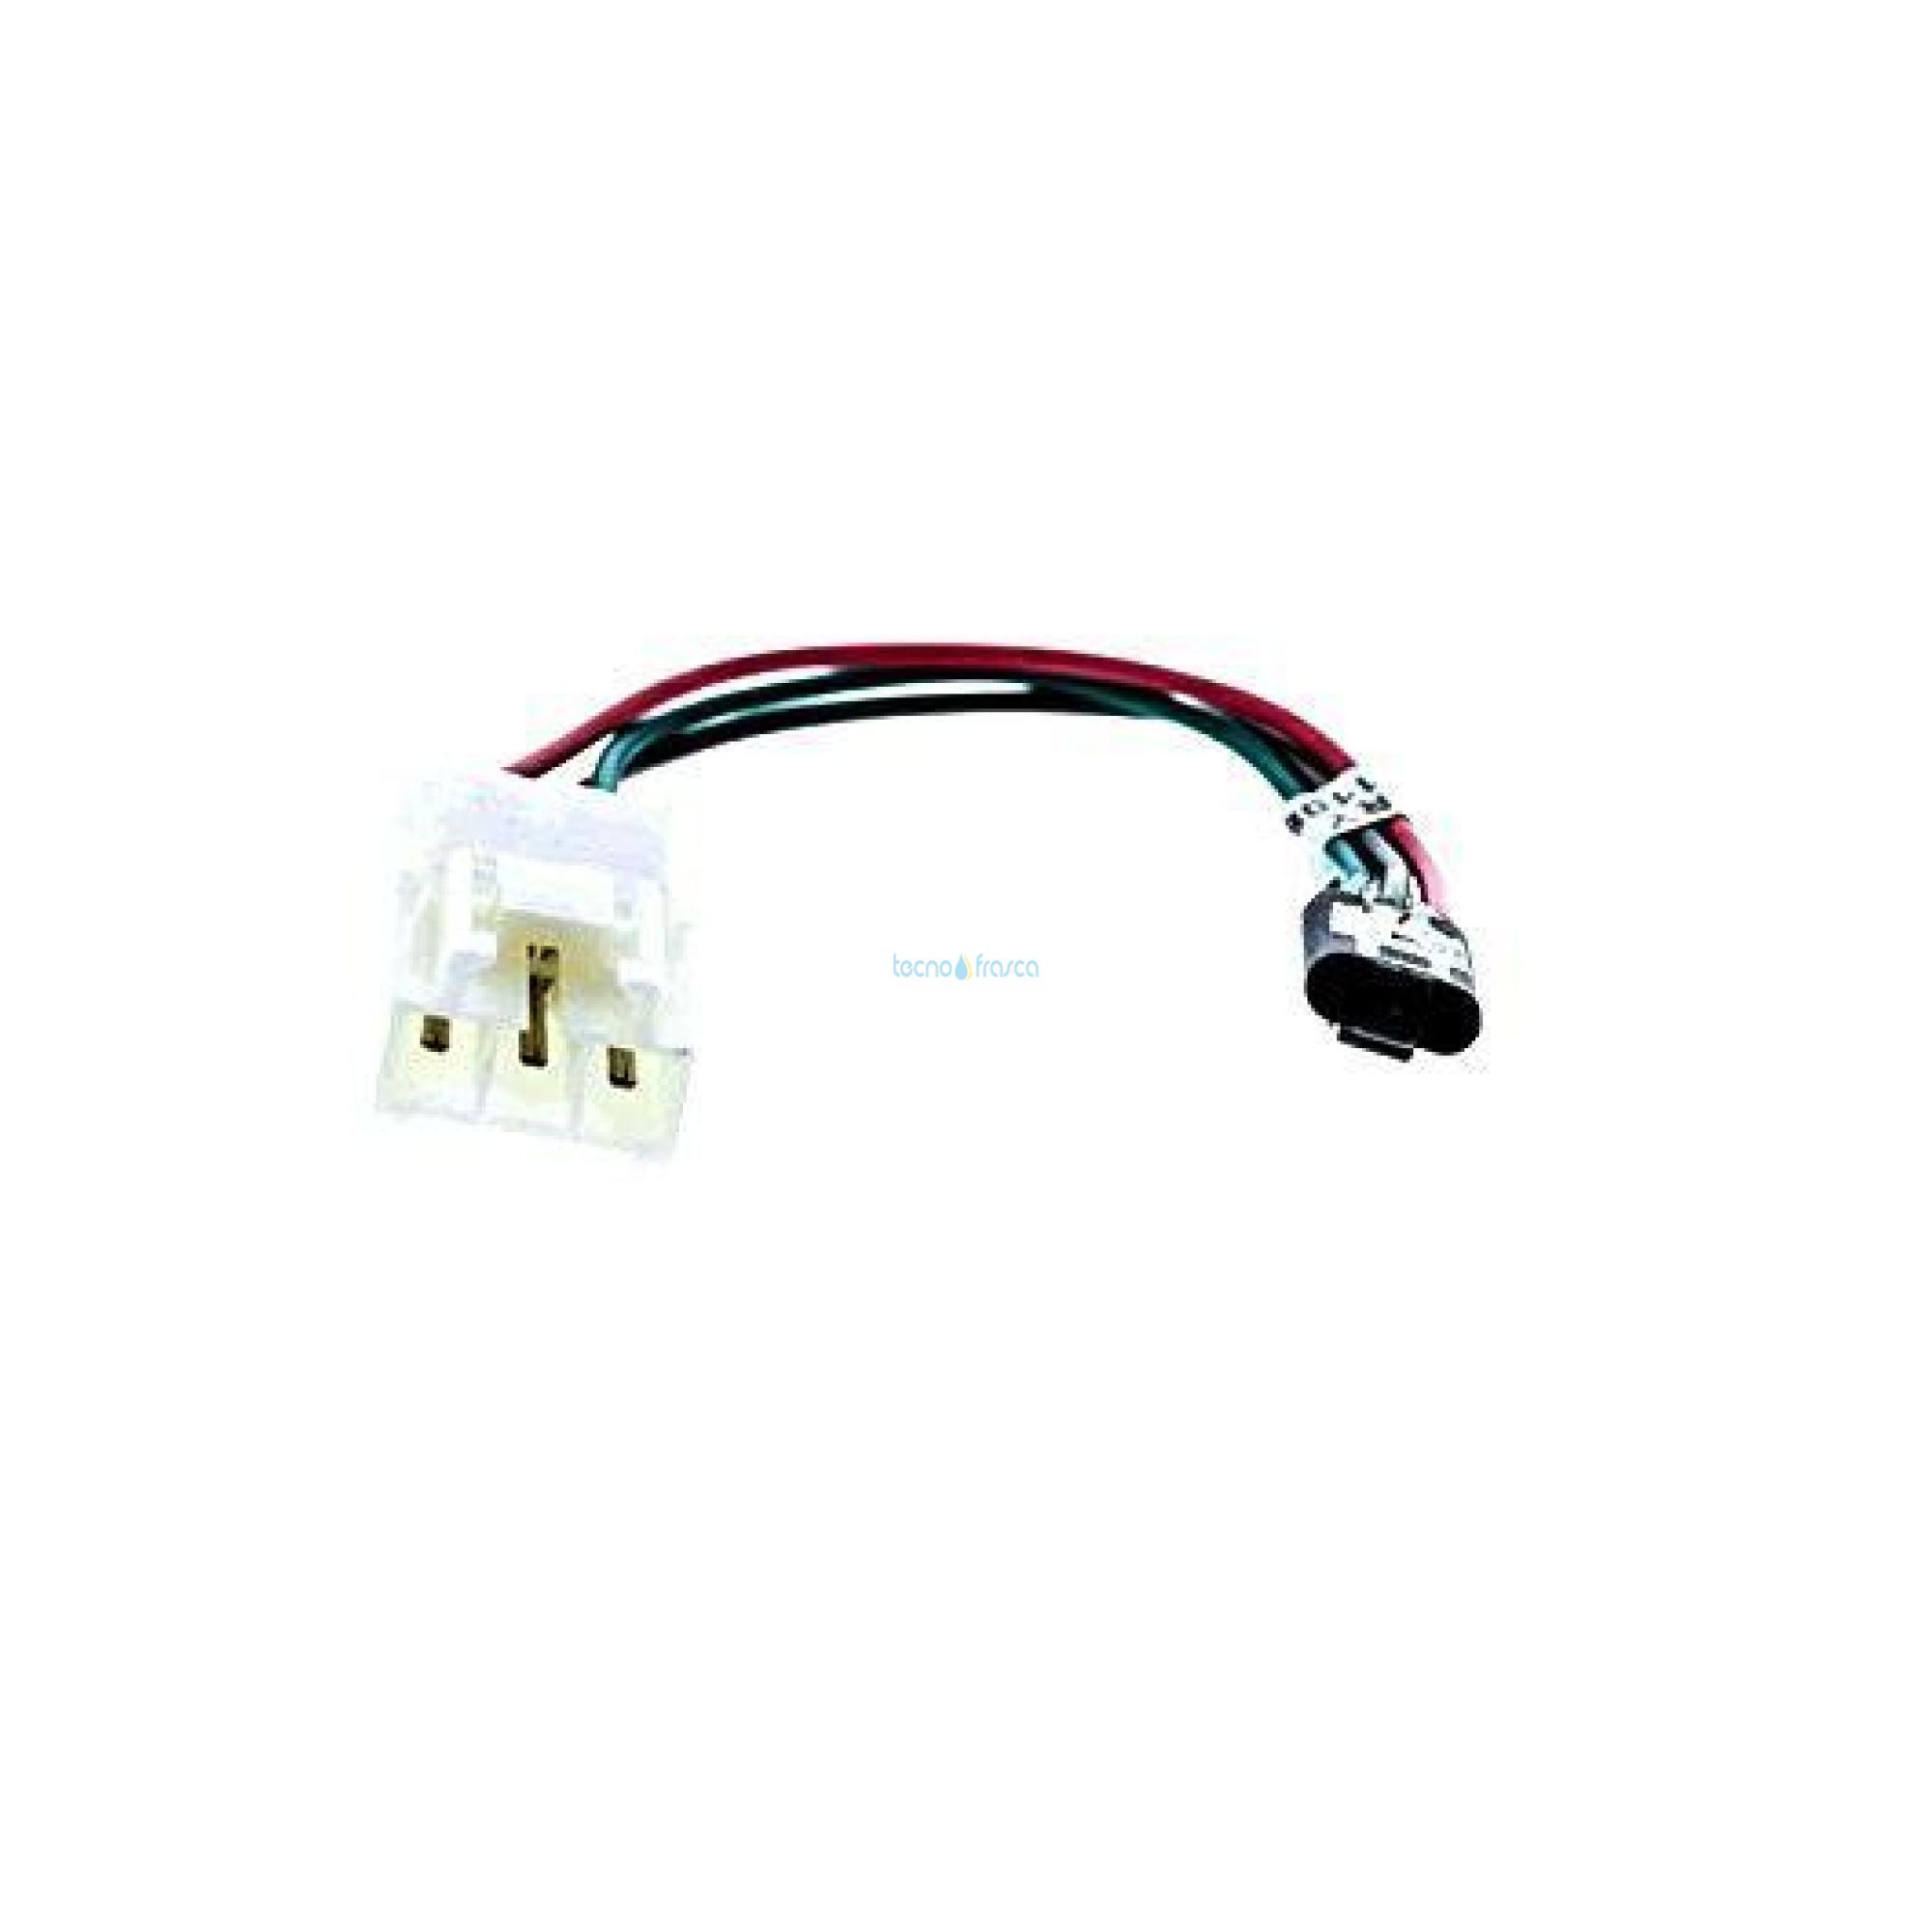 Vaillant sensore hall vmw pro 711933